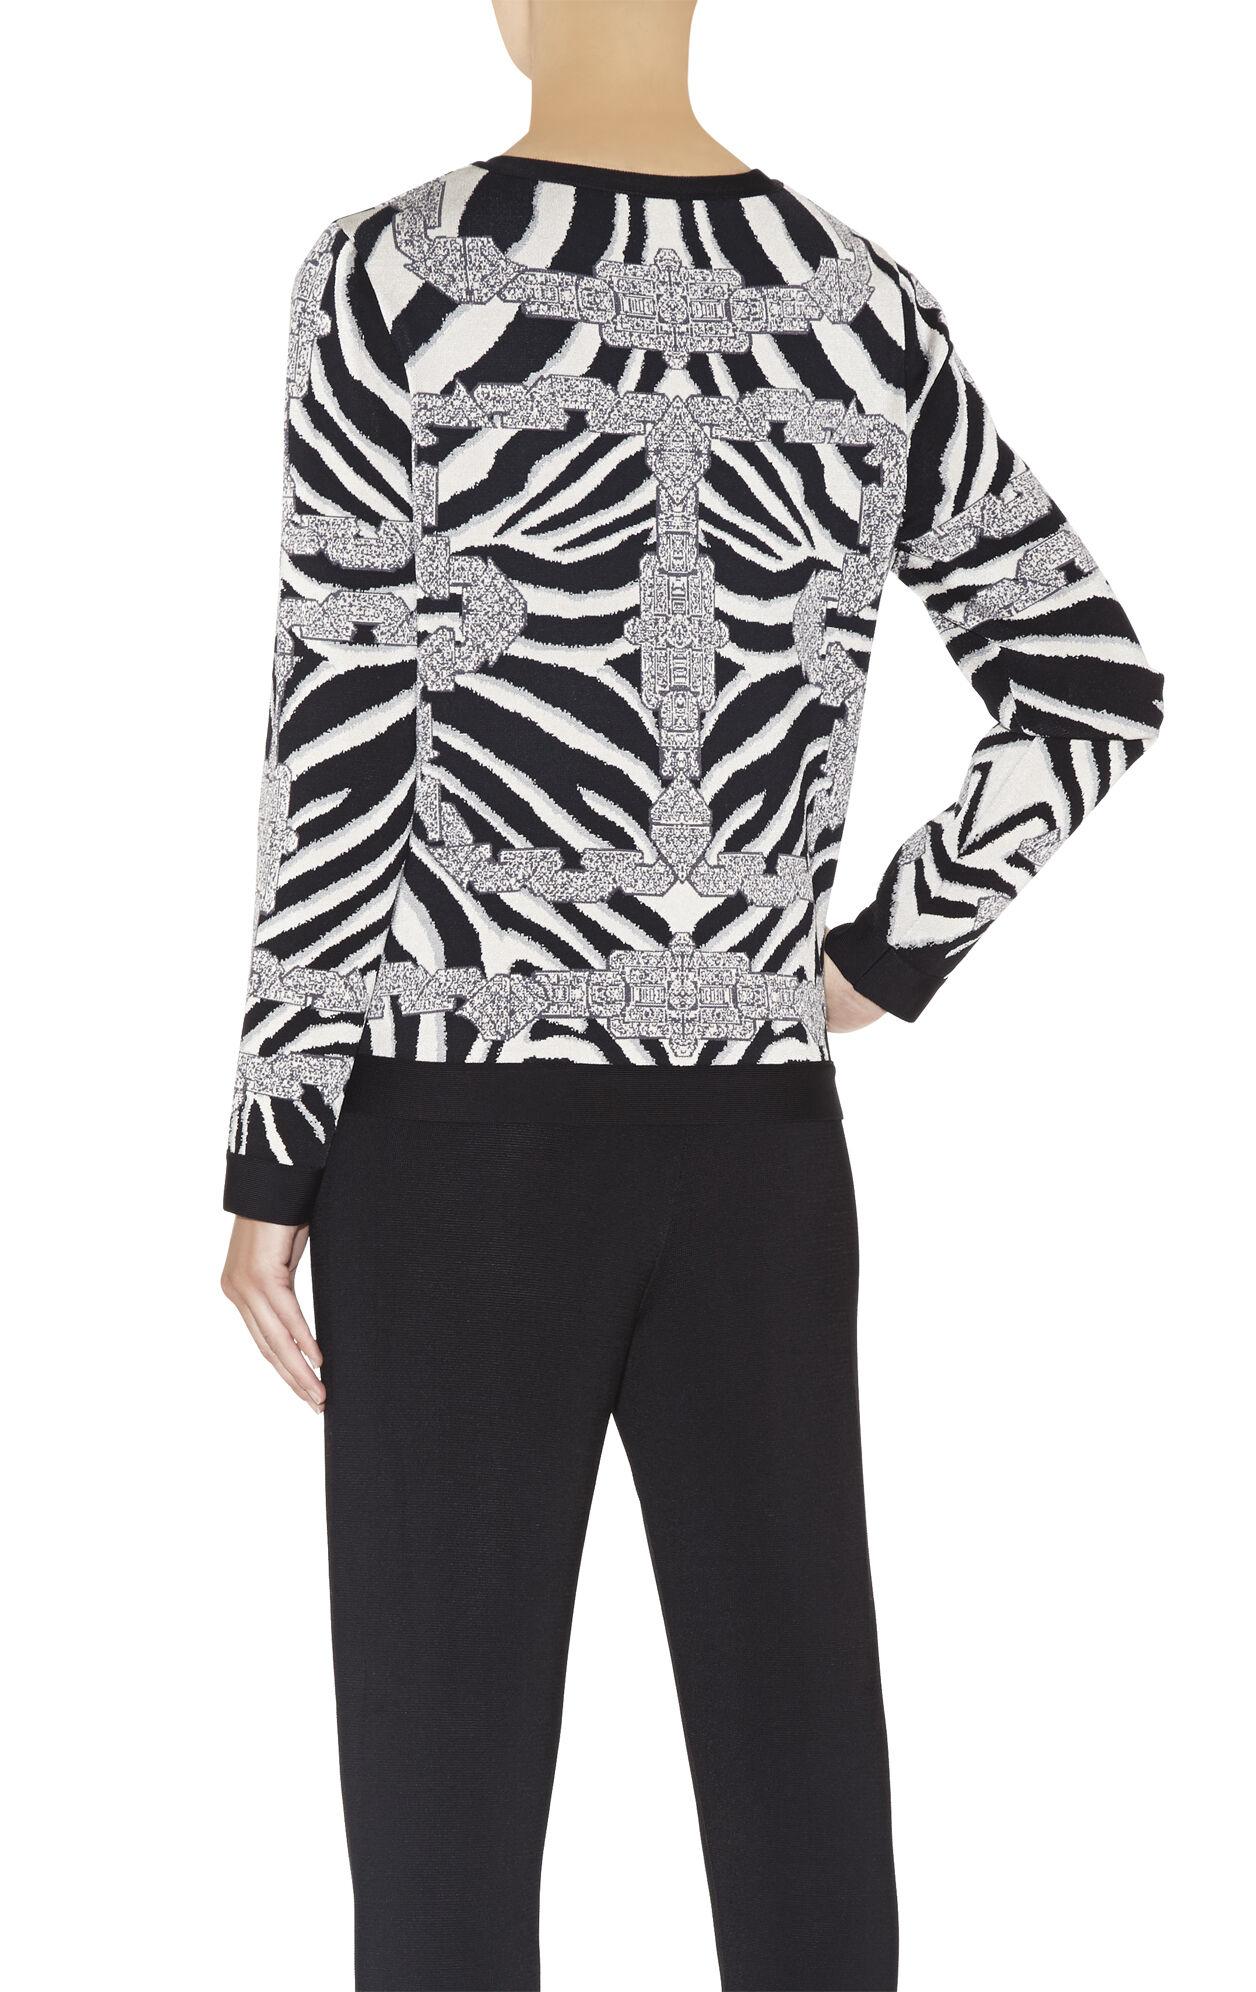 Ronja Chain Detail Zebra Jacquard Top